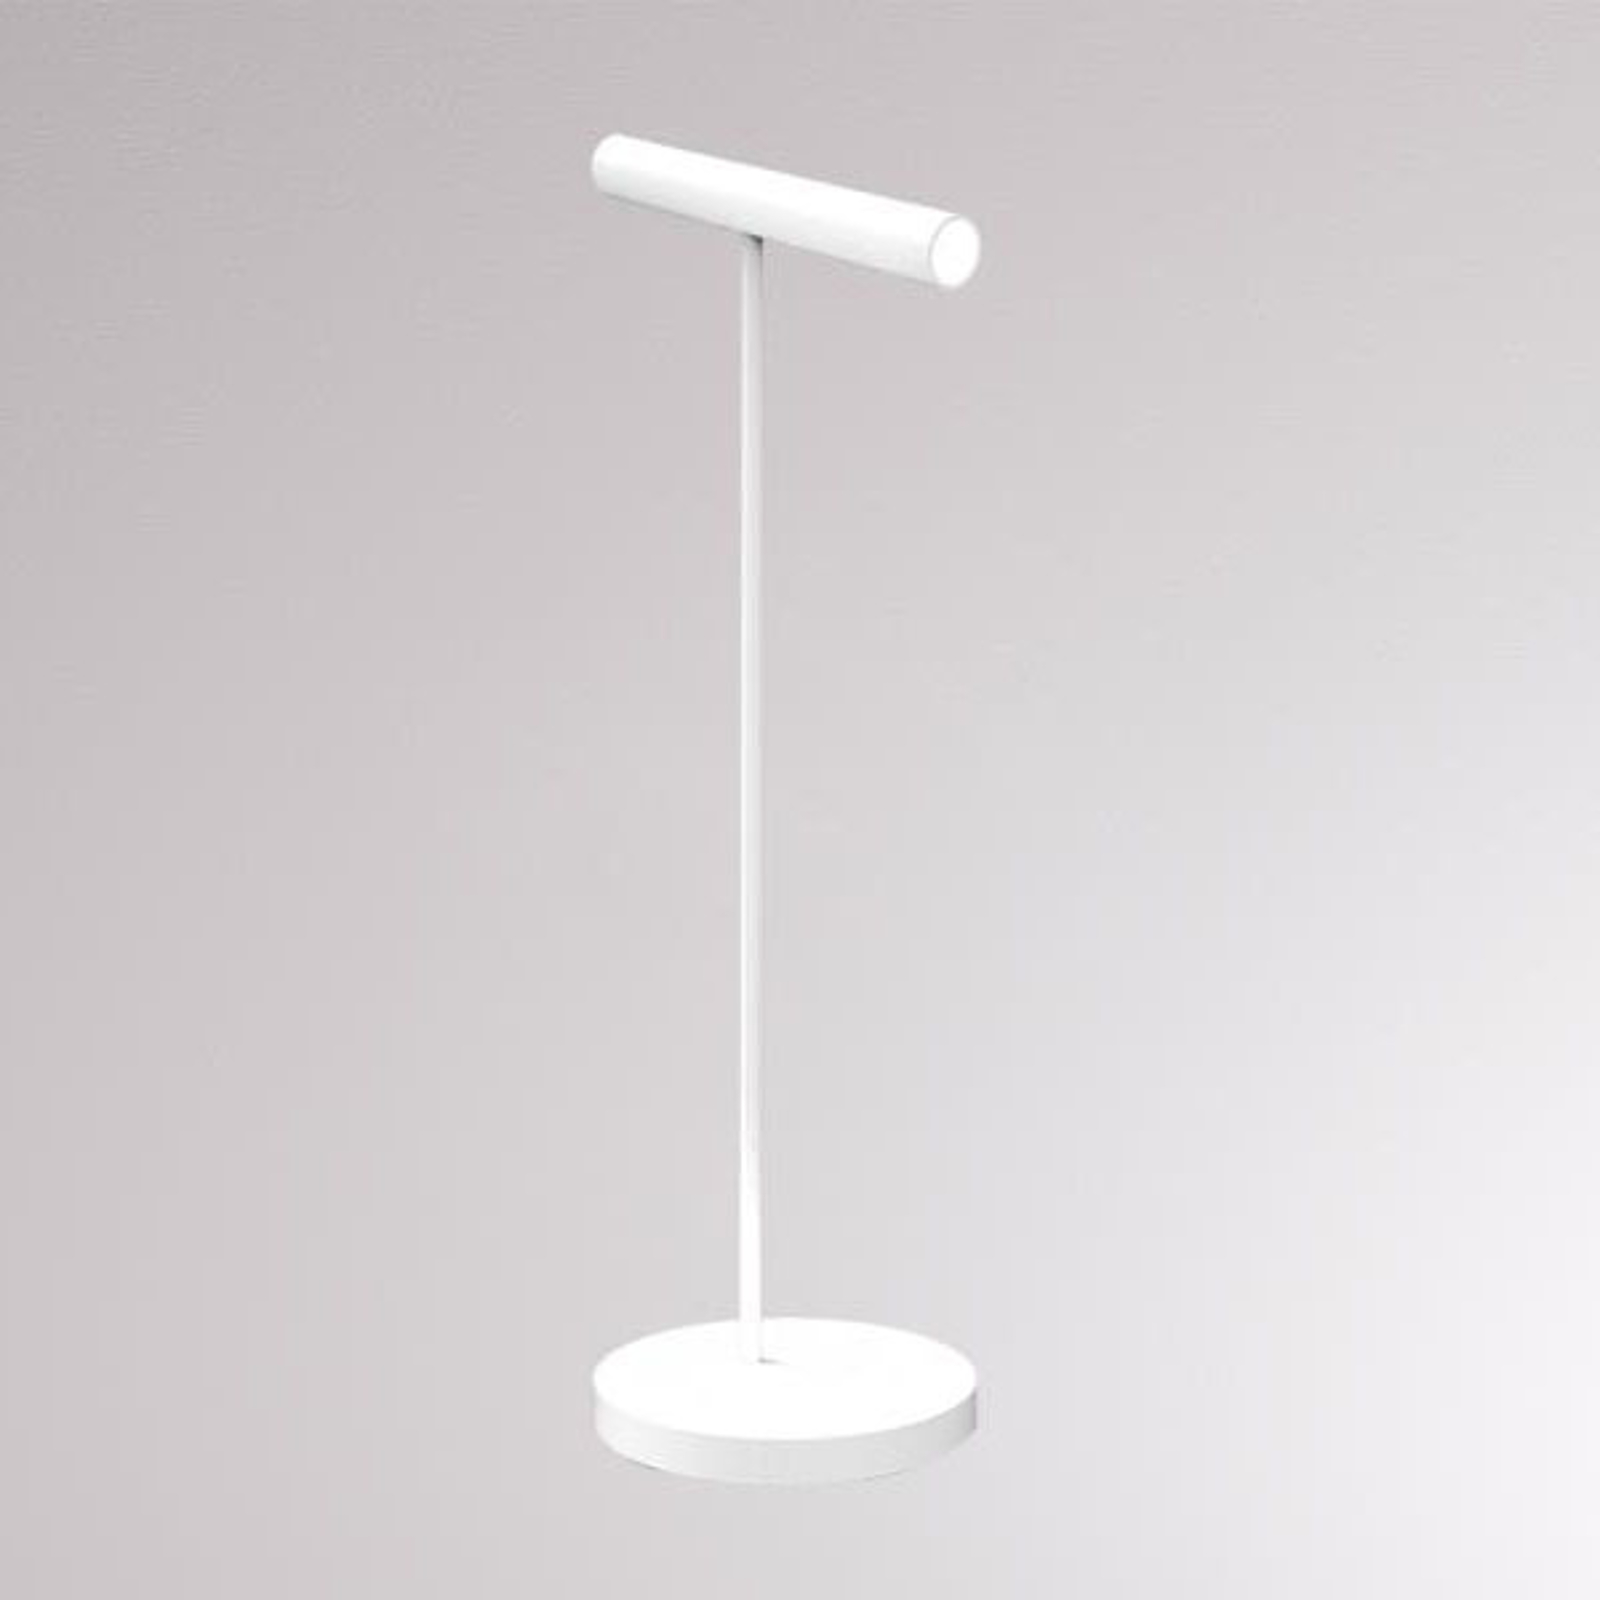 LOUM Meyjo LED-Tischleuchte weiß